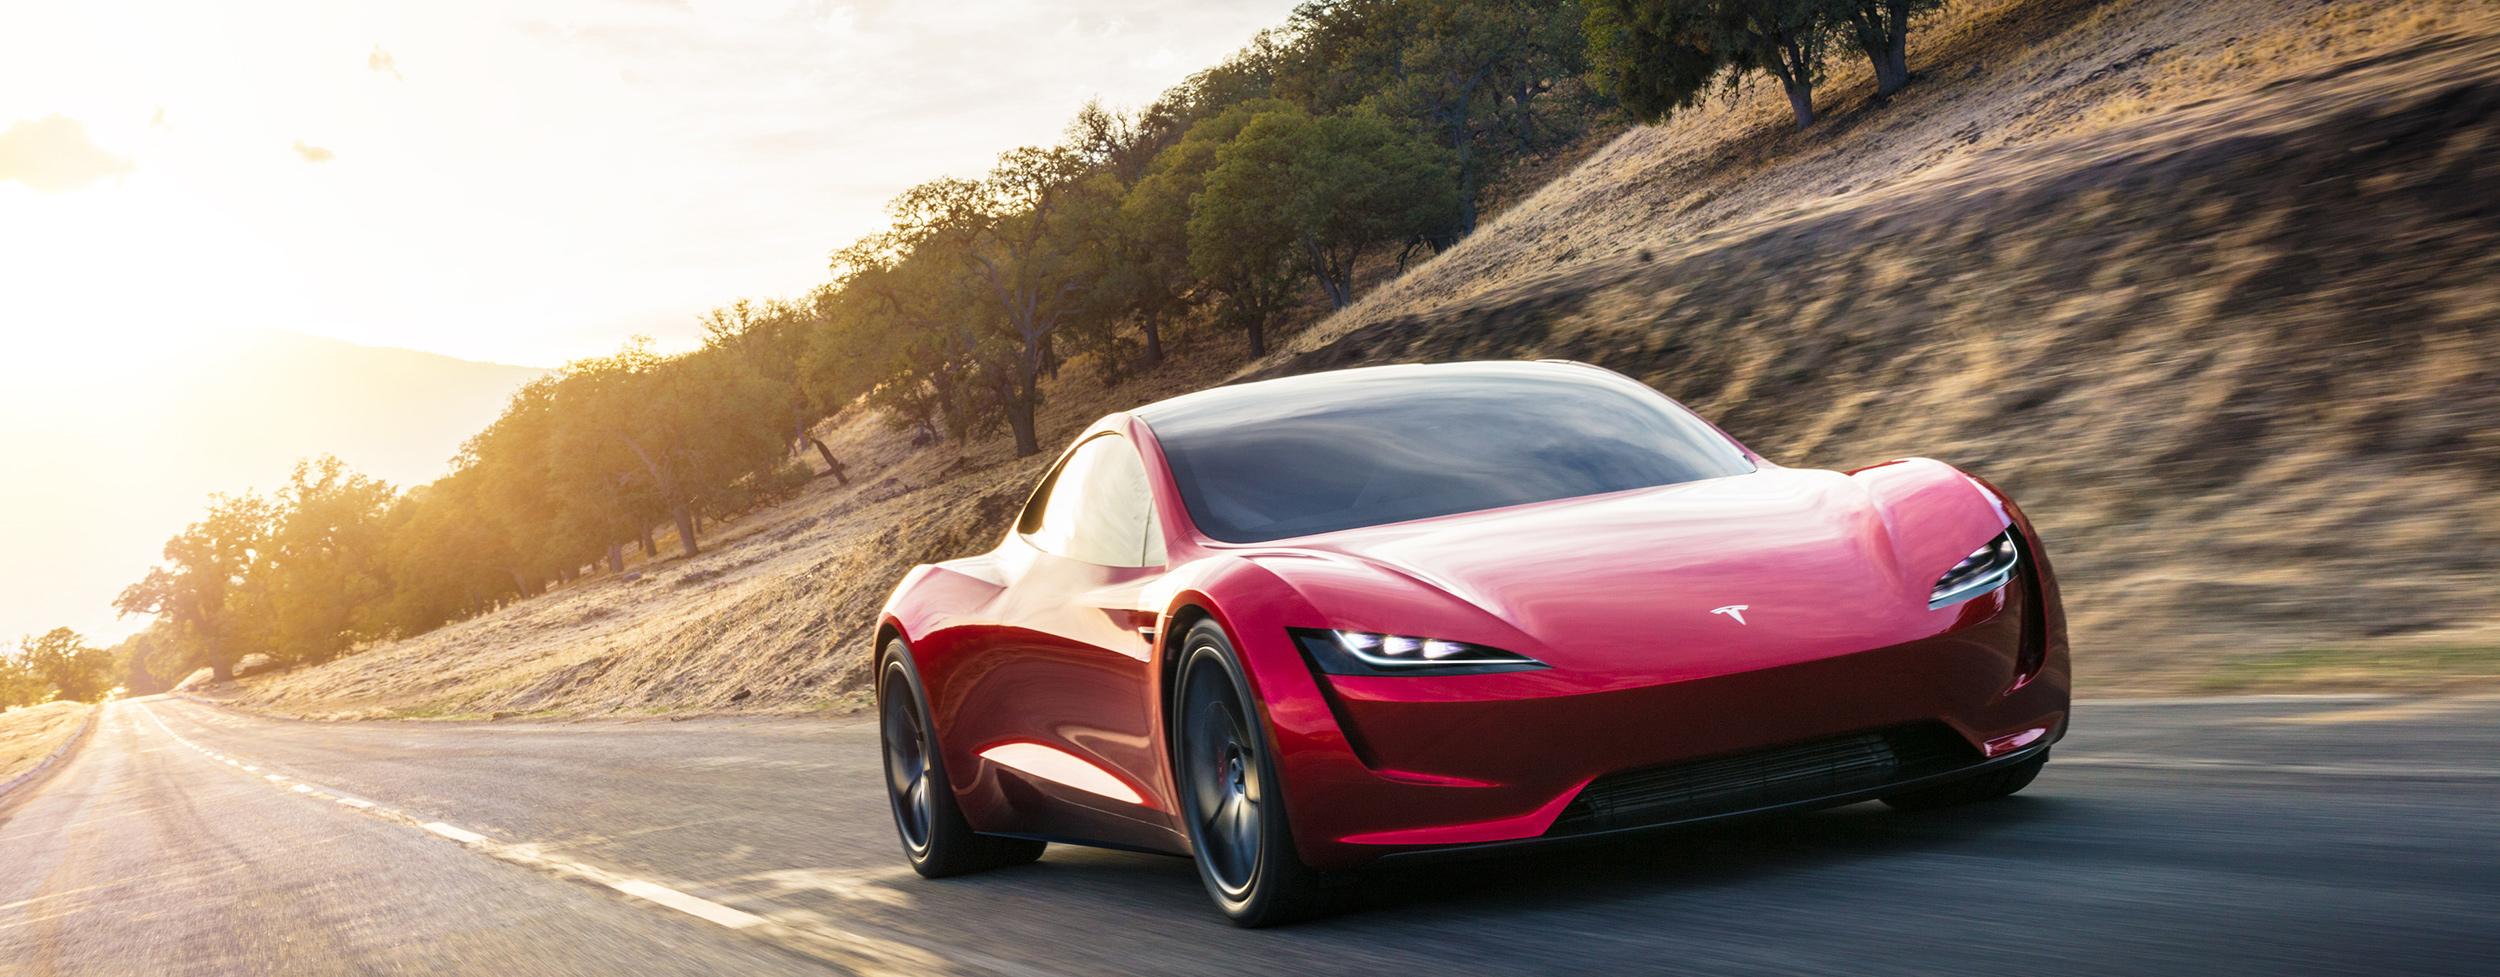 Electric Car Co Inc